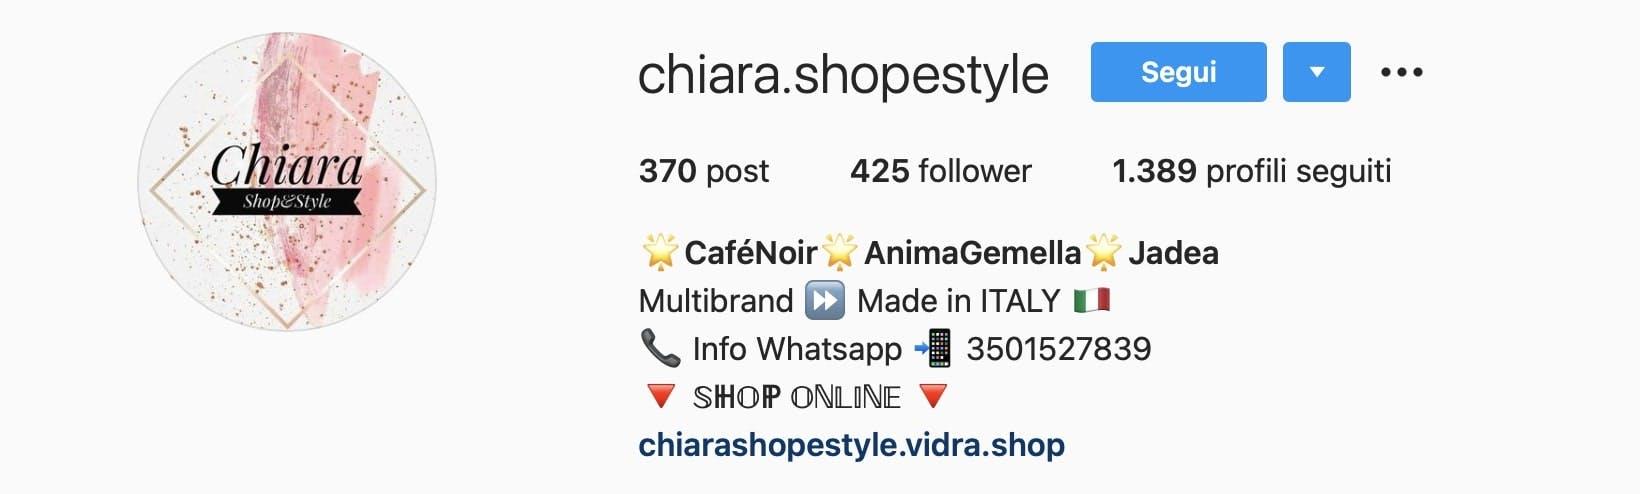 biografia instagram aggiungere link sito web